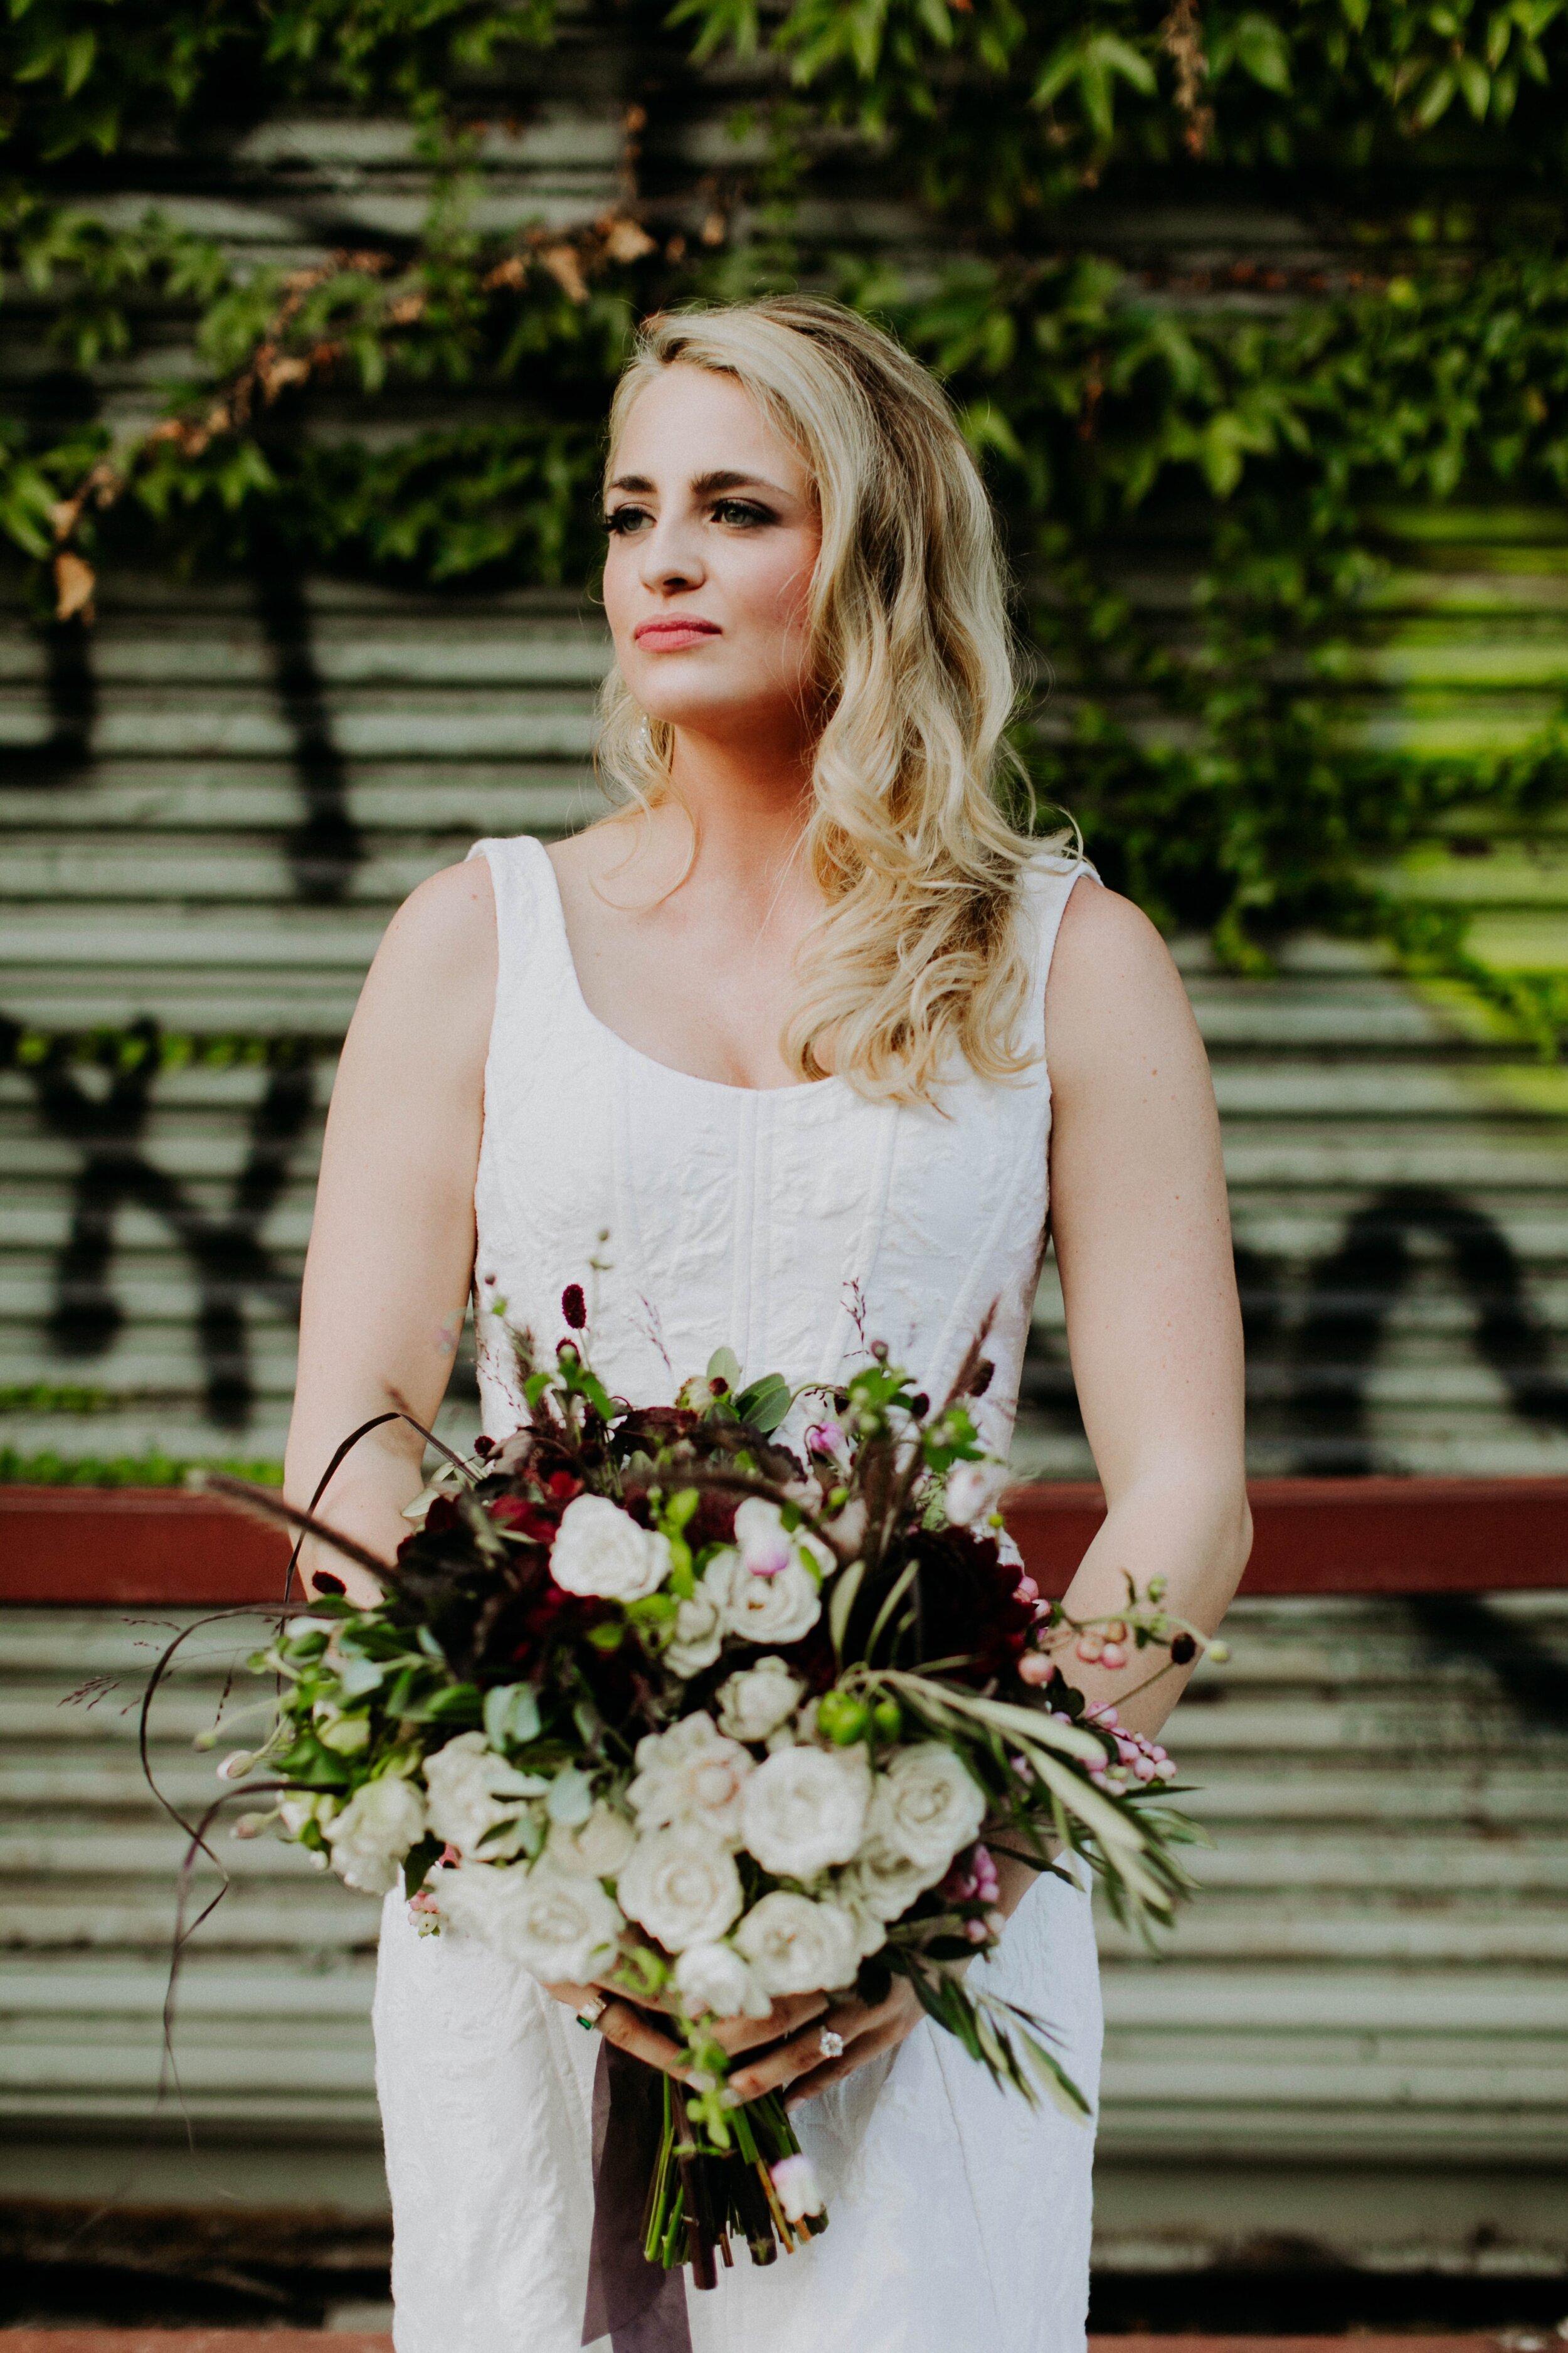 brooklyn-wedding-photographer-amber-gress-0192-JPG.JPG